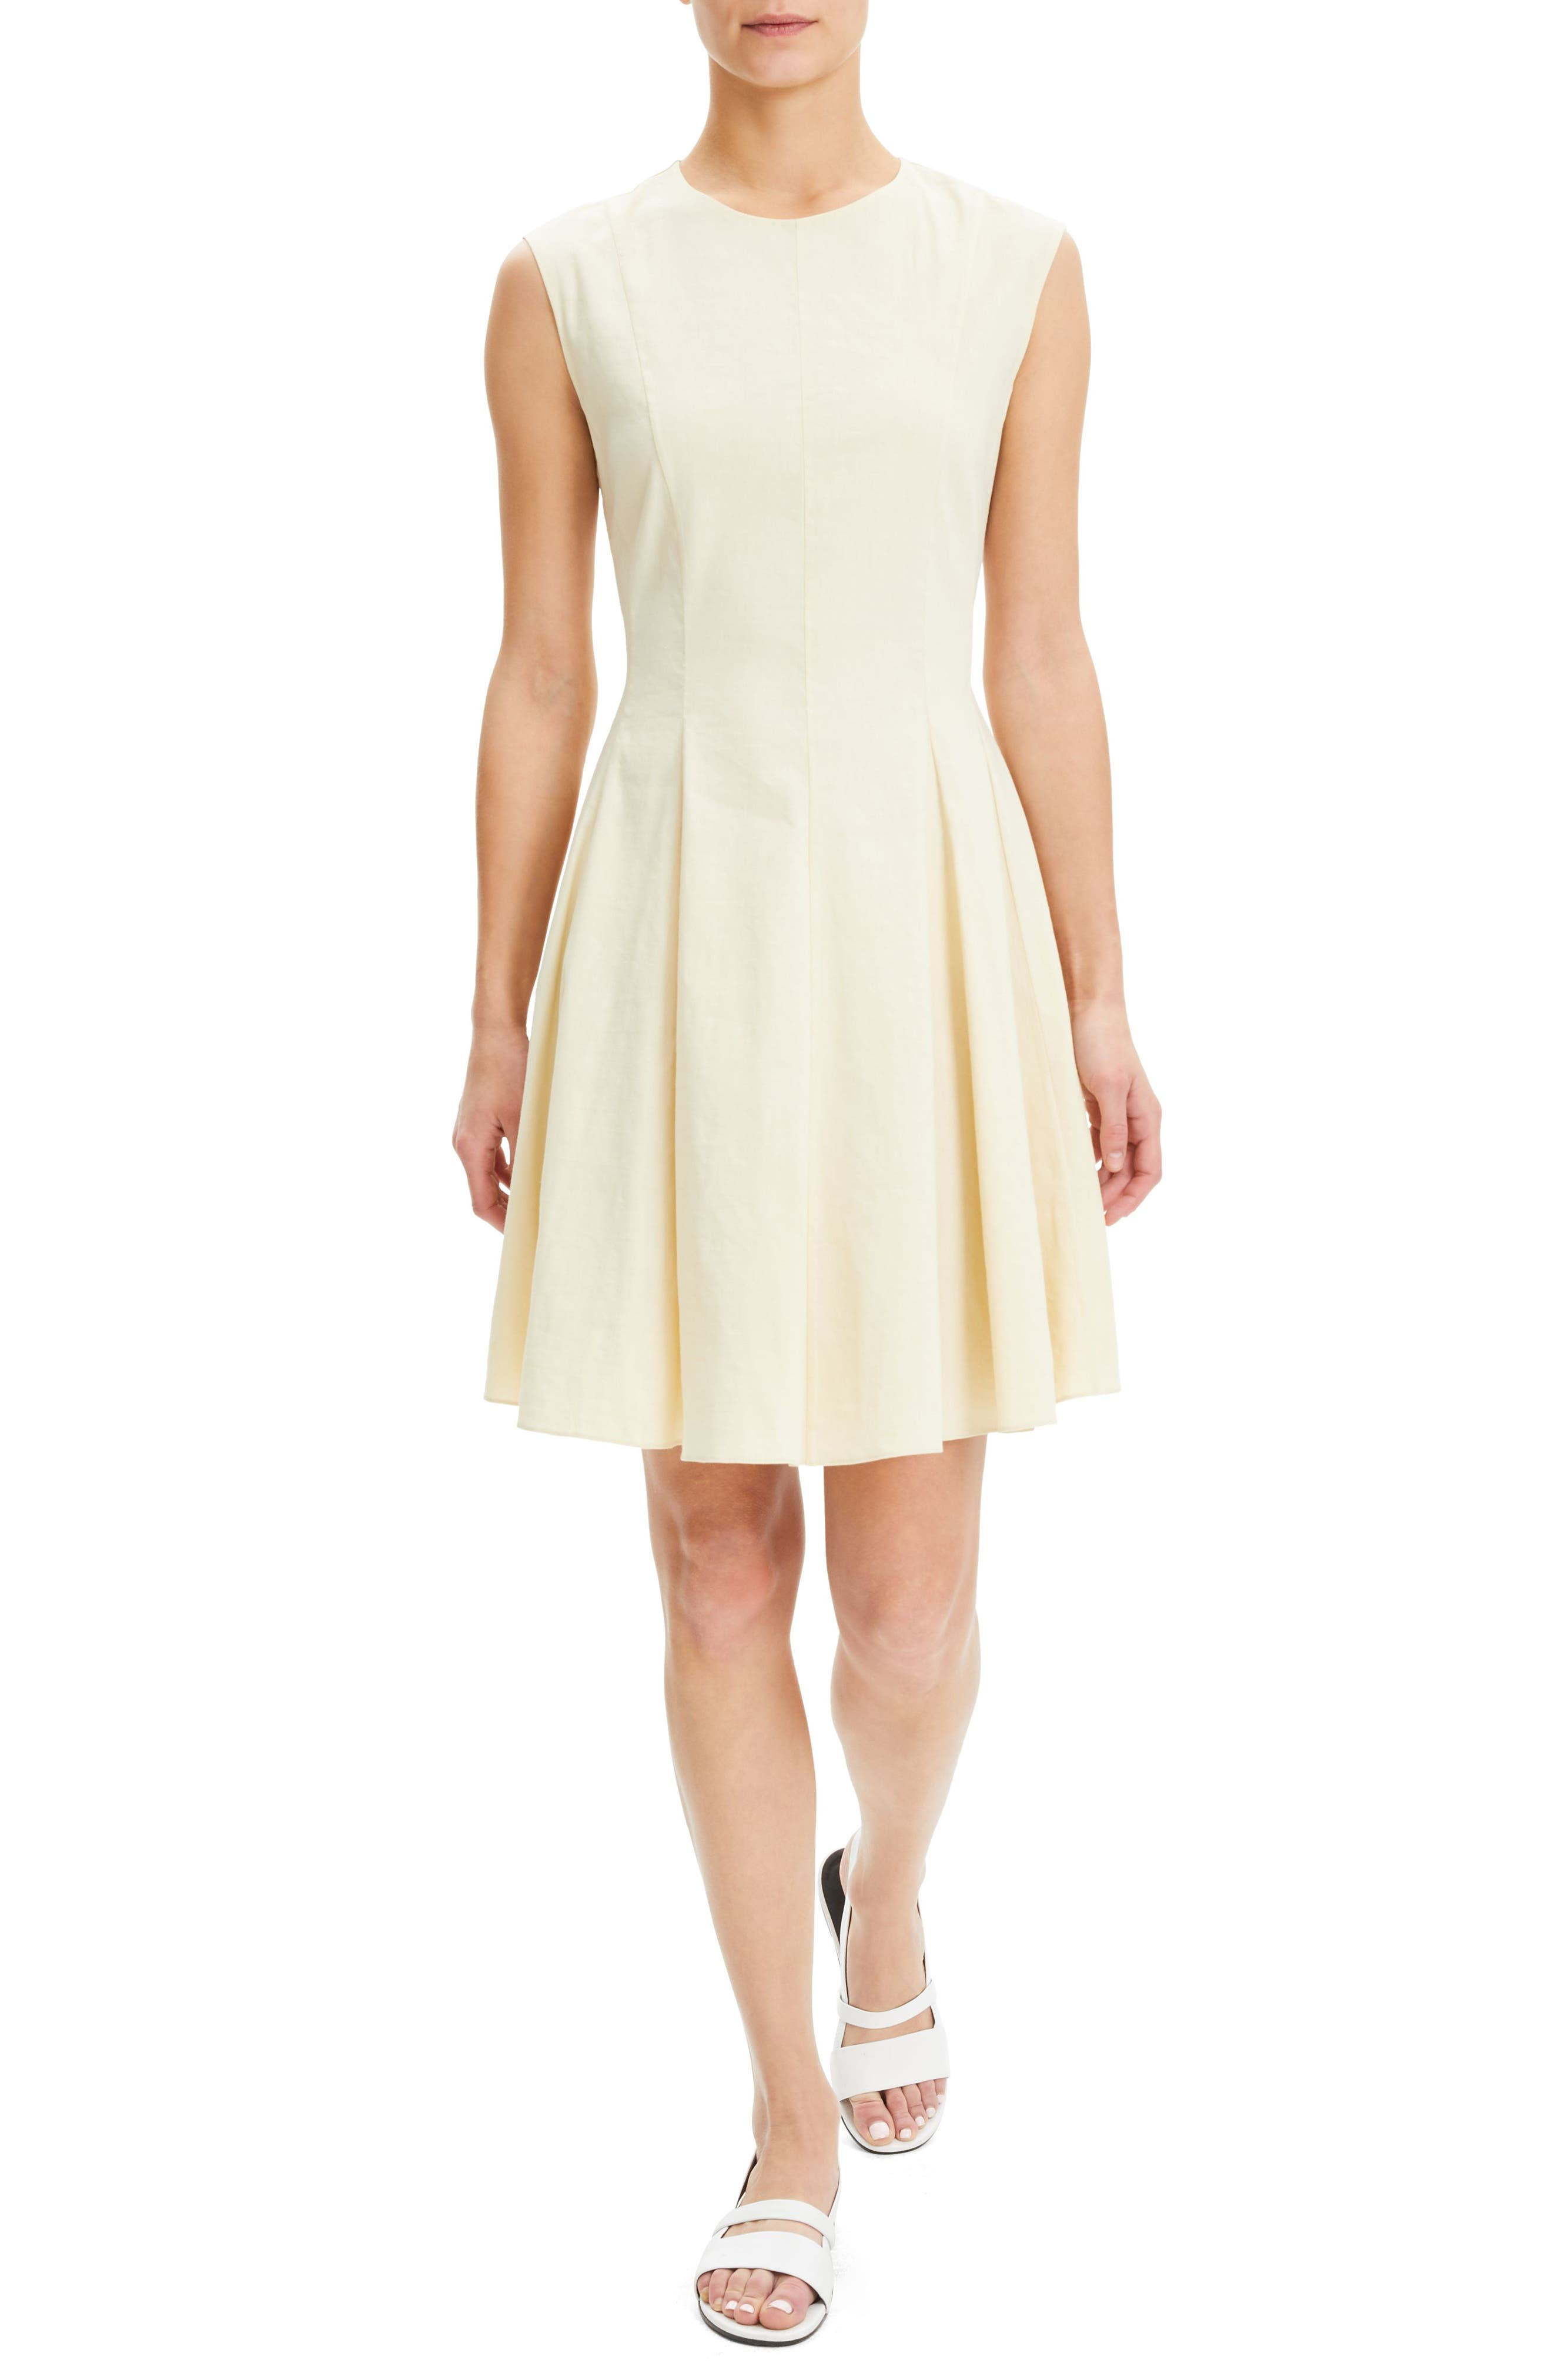 Theory Sleeveless Linen Blend Fit & Flare Dress, Beige